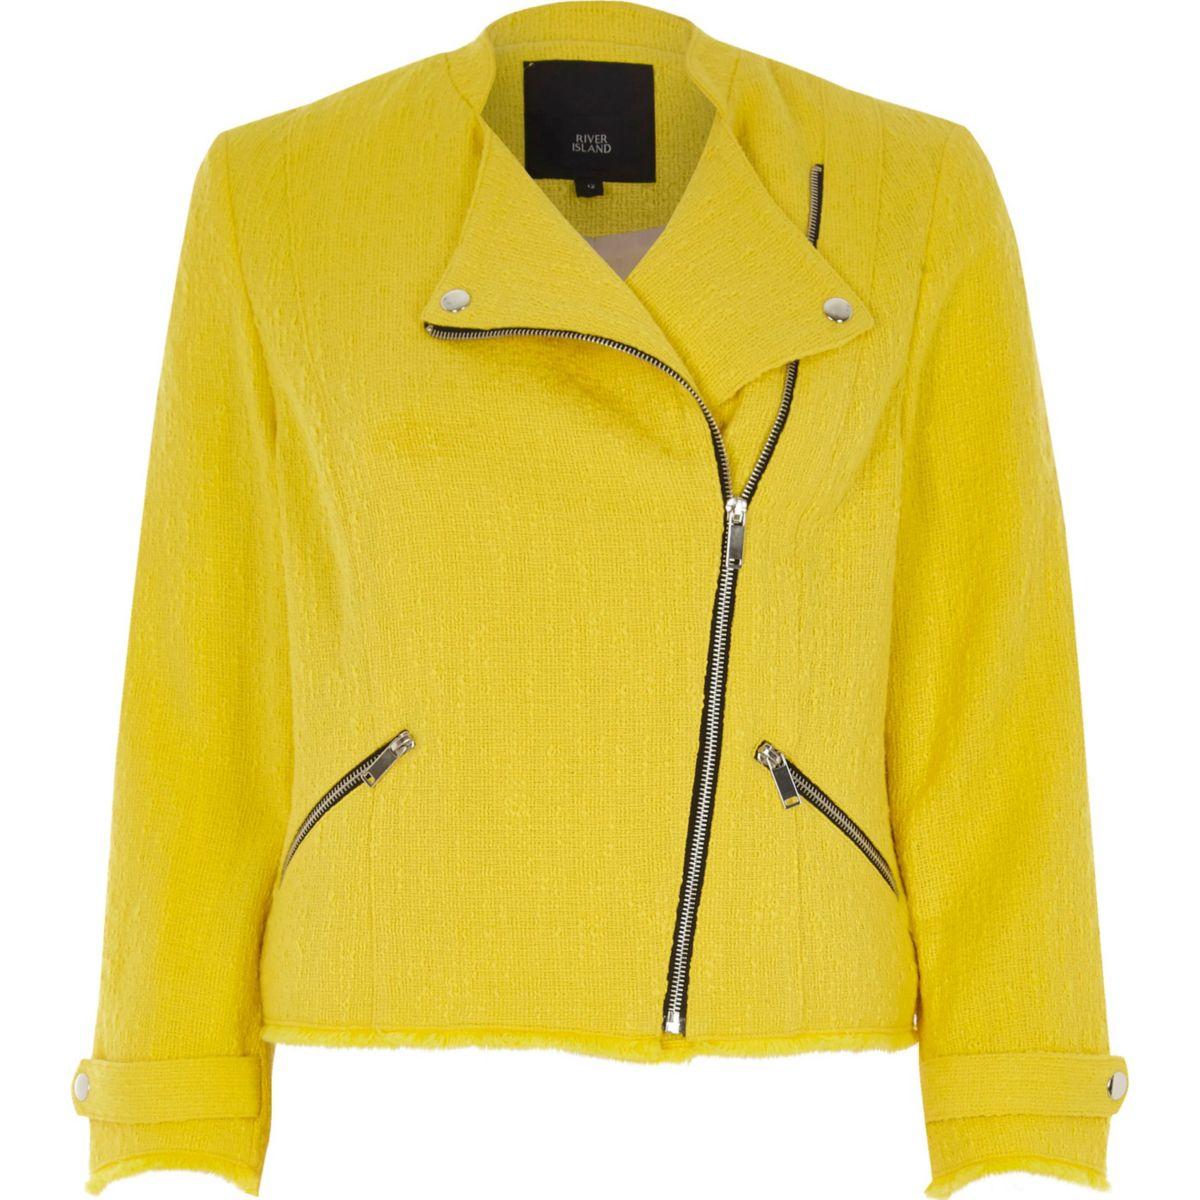 Yellow Boucle Biker Jacket - Coats & Jackets - Sale - Women